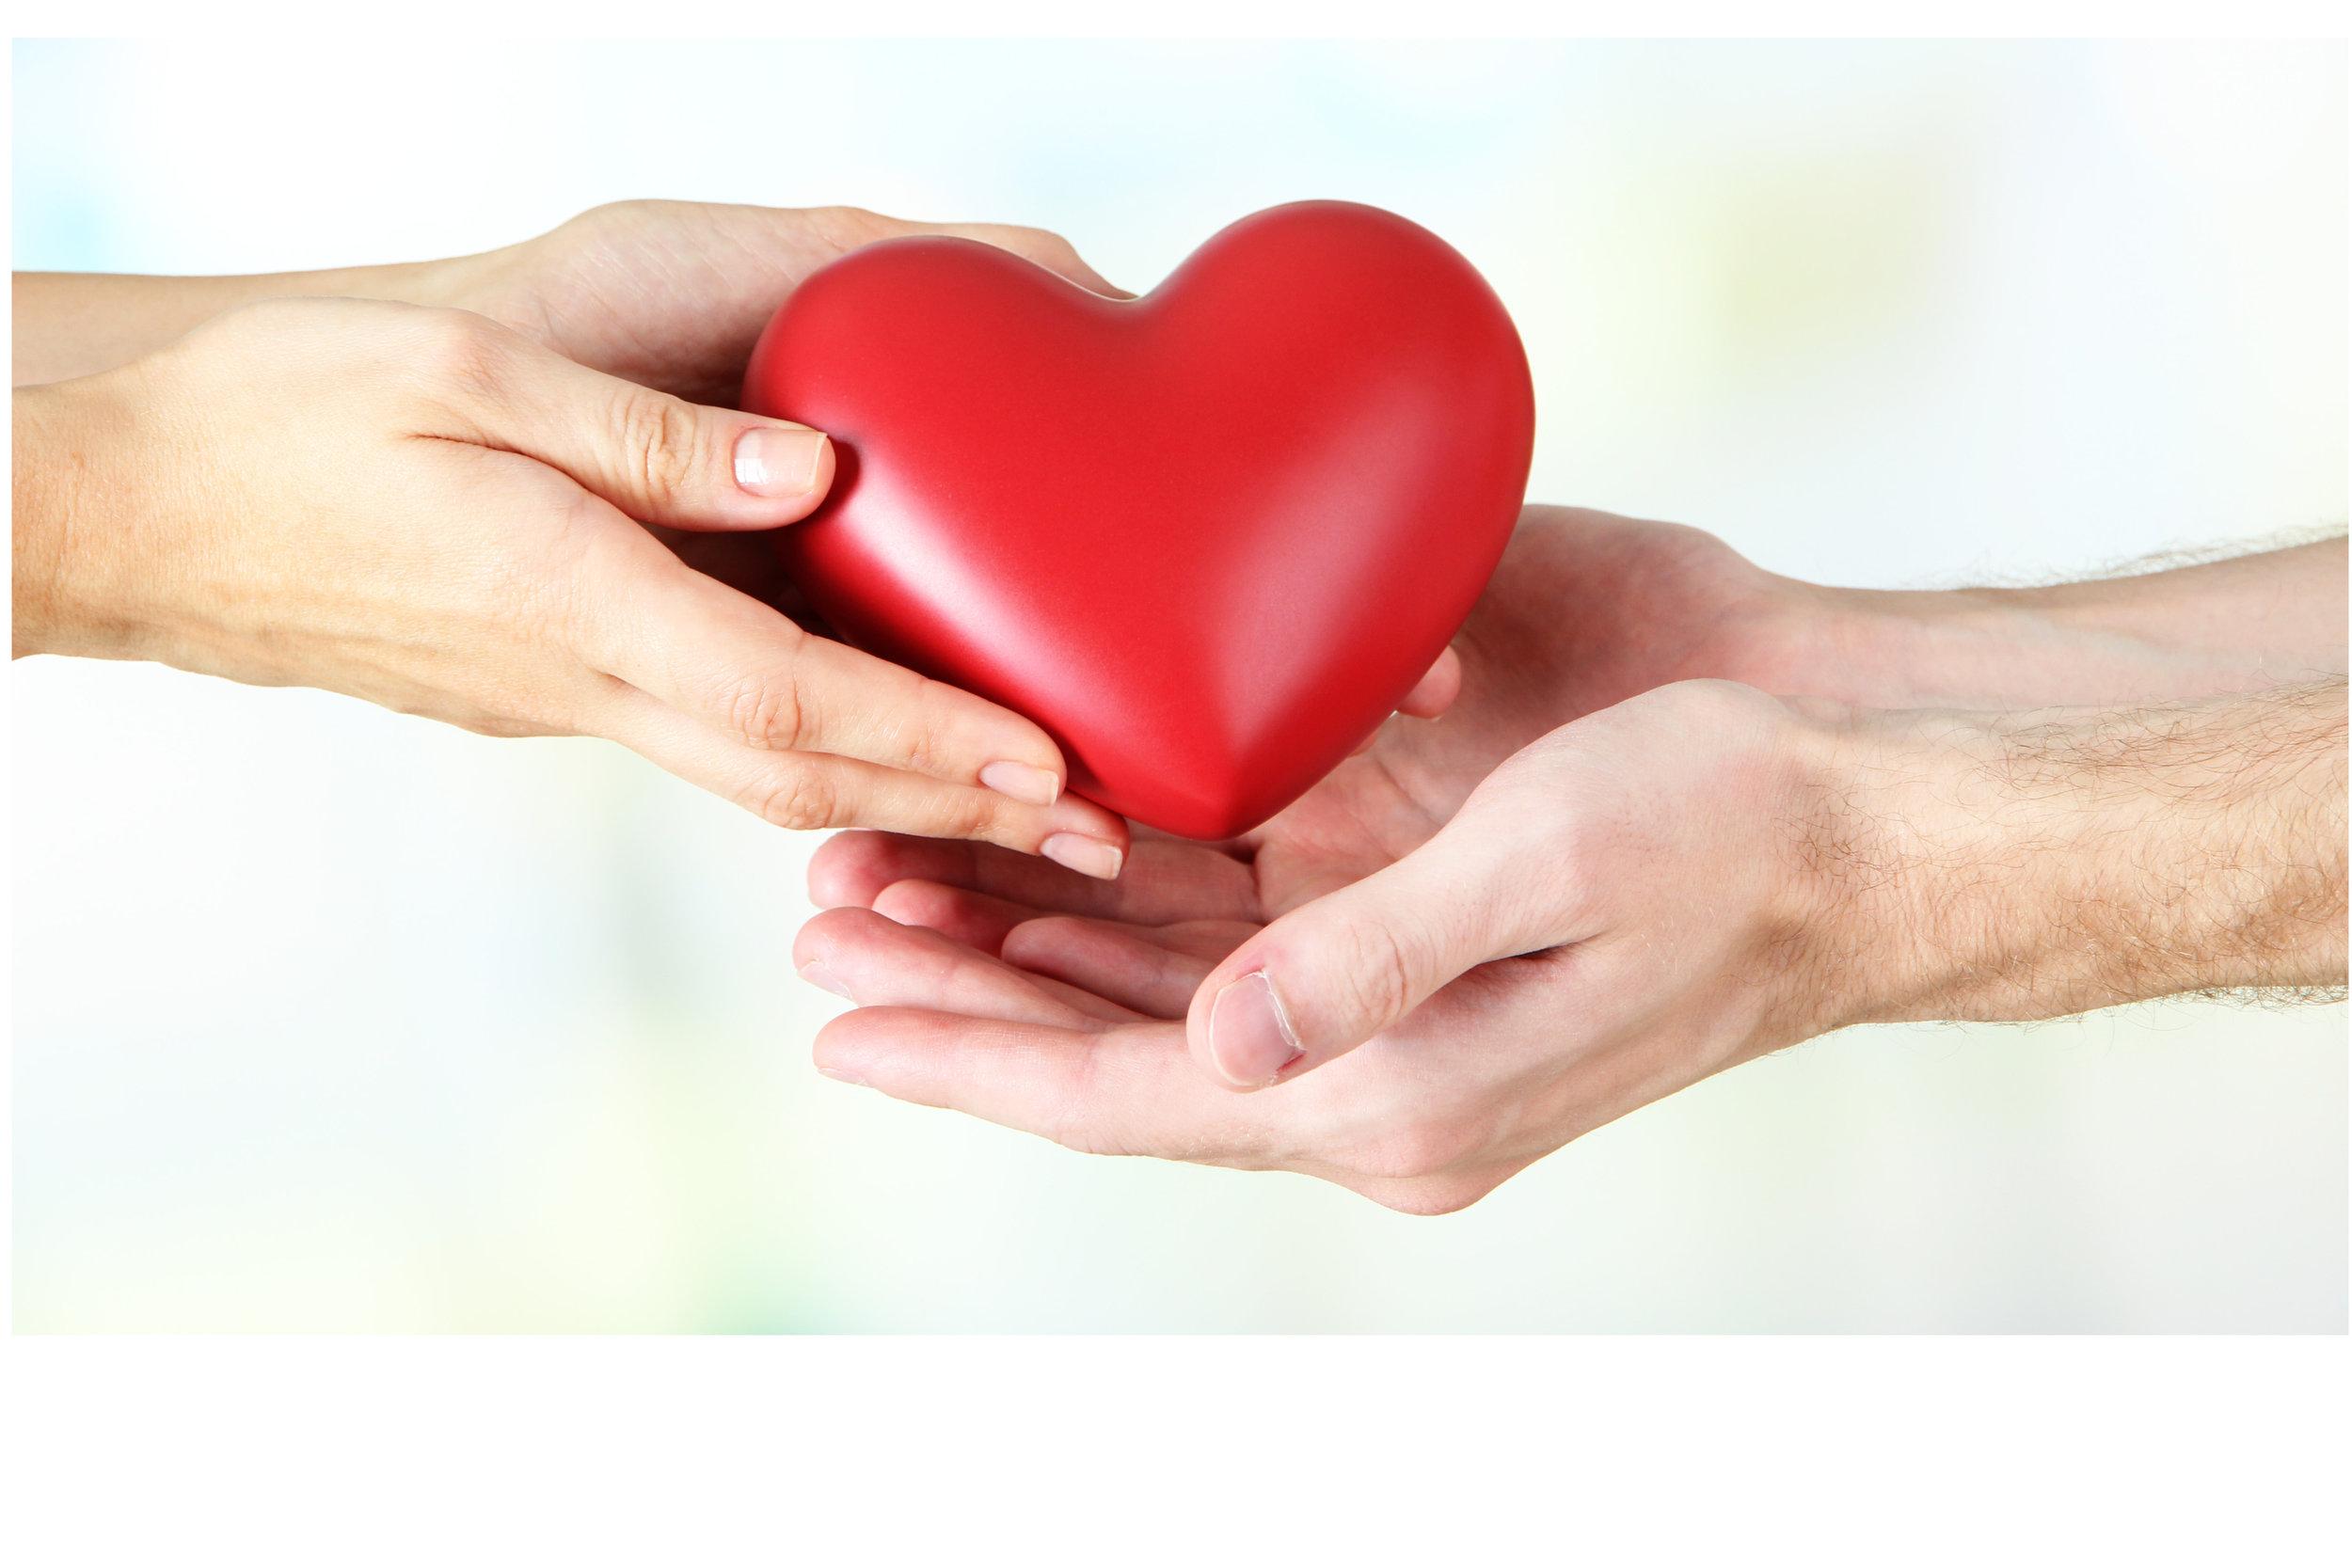 heart in hands 2.jpg